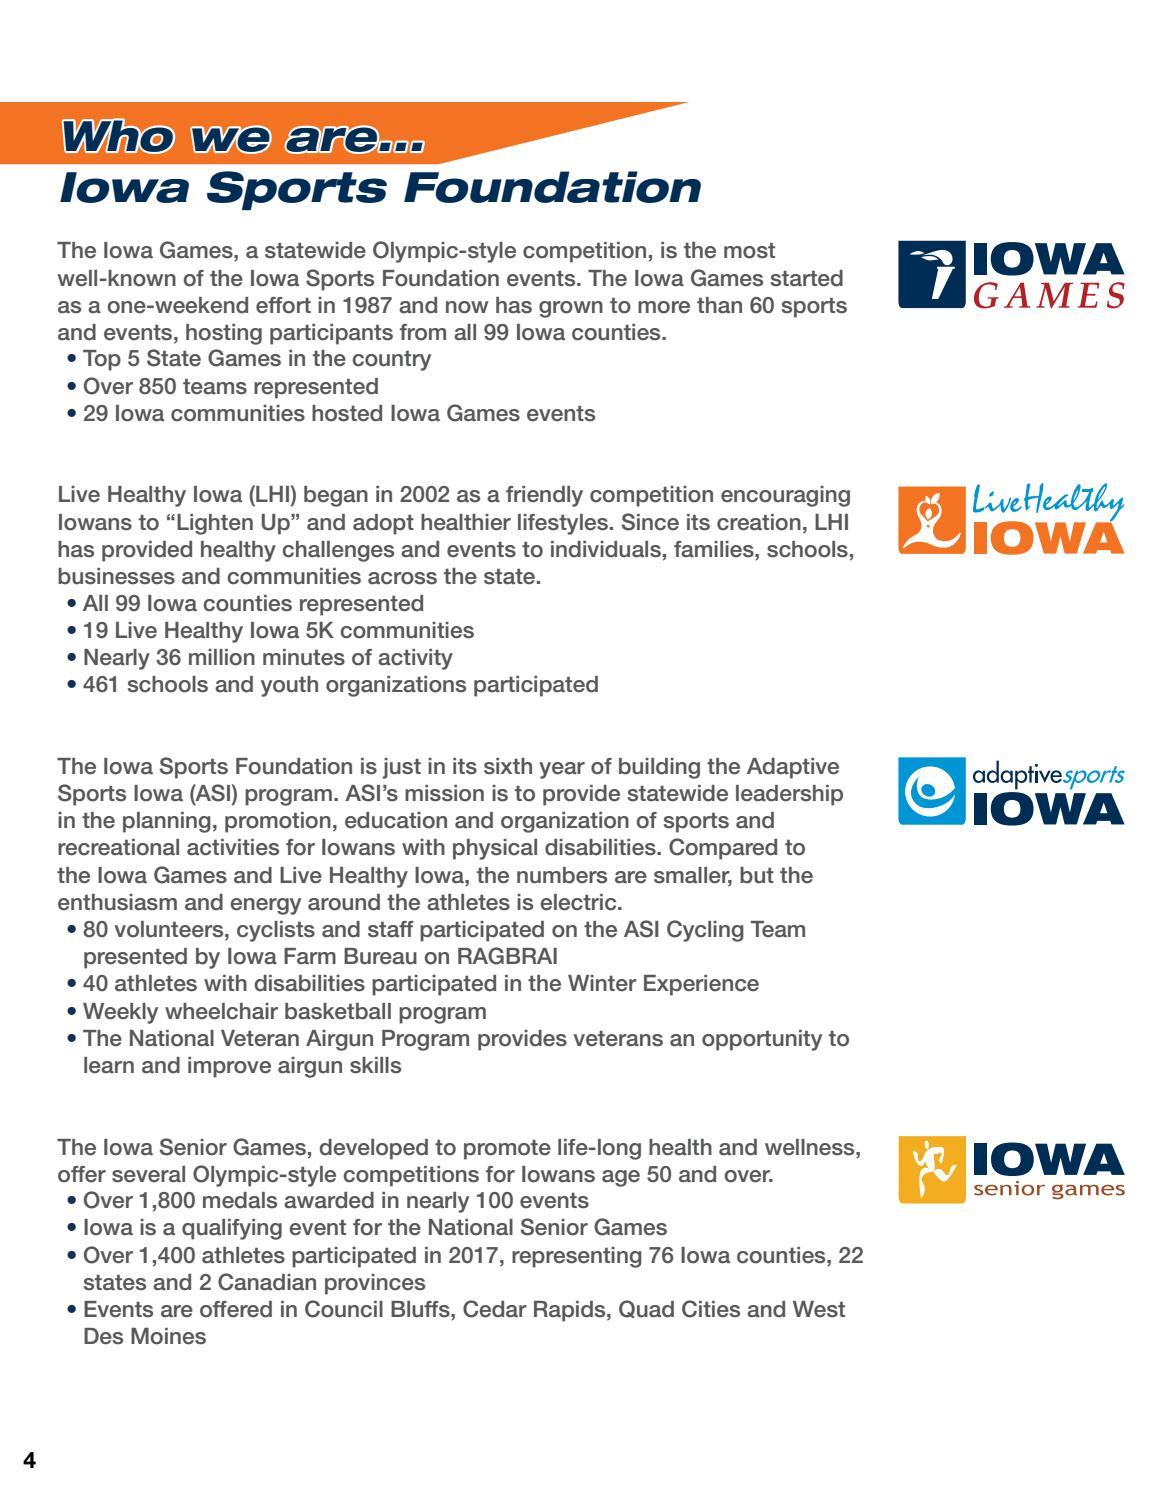 2016-2017 Iowa Sports Foundation Annual Report